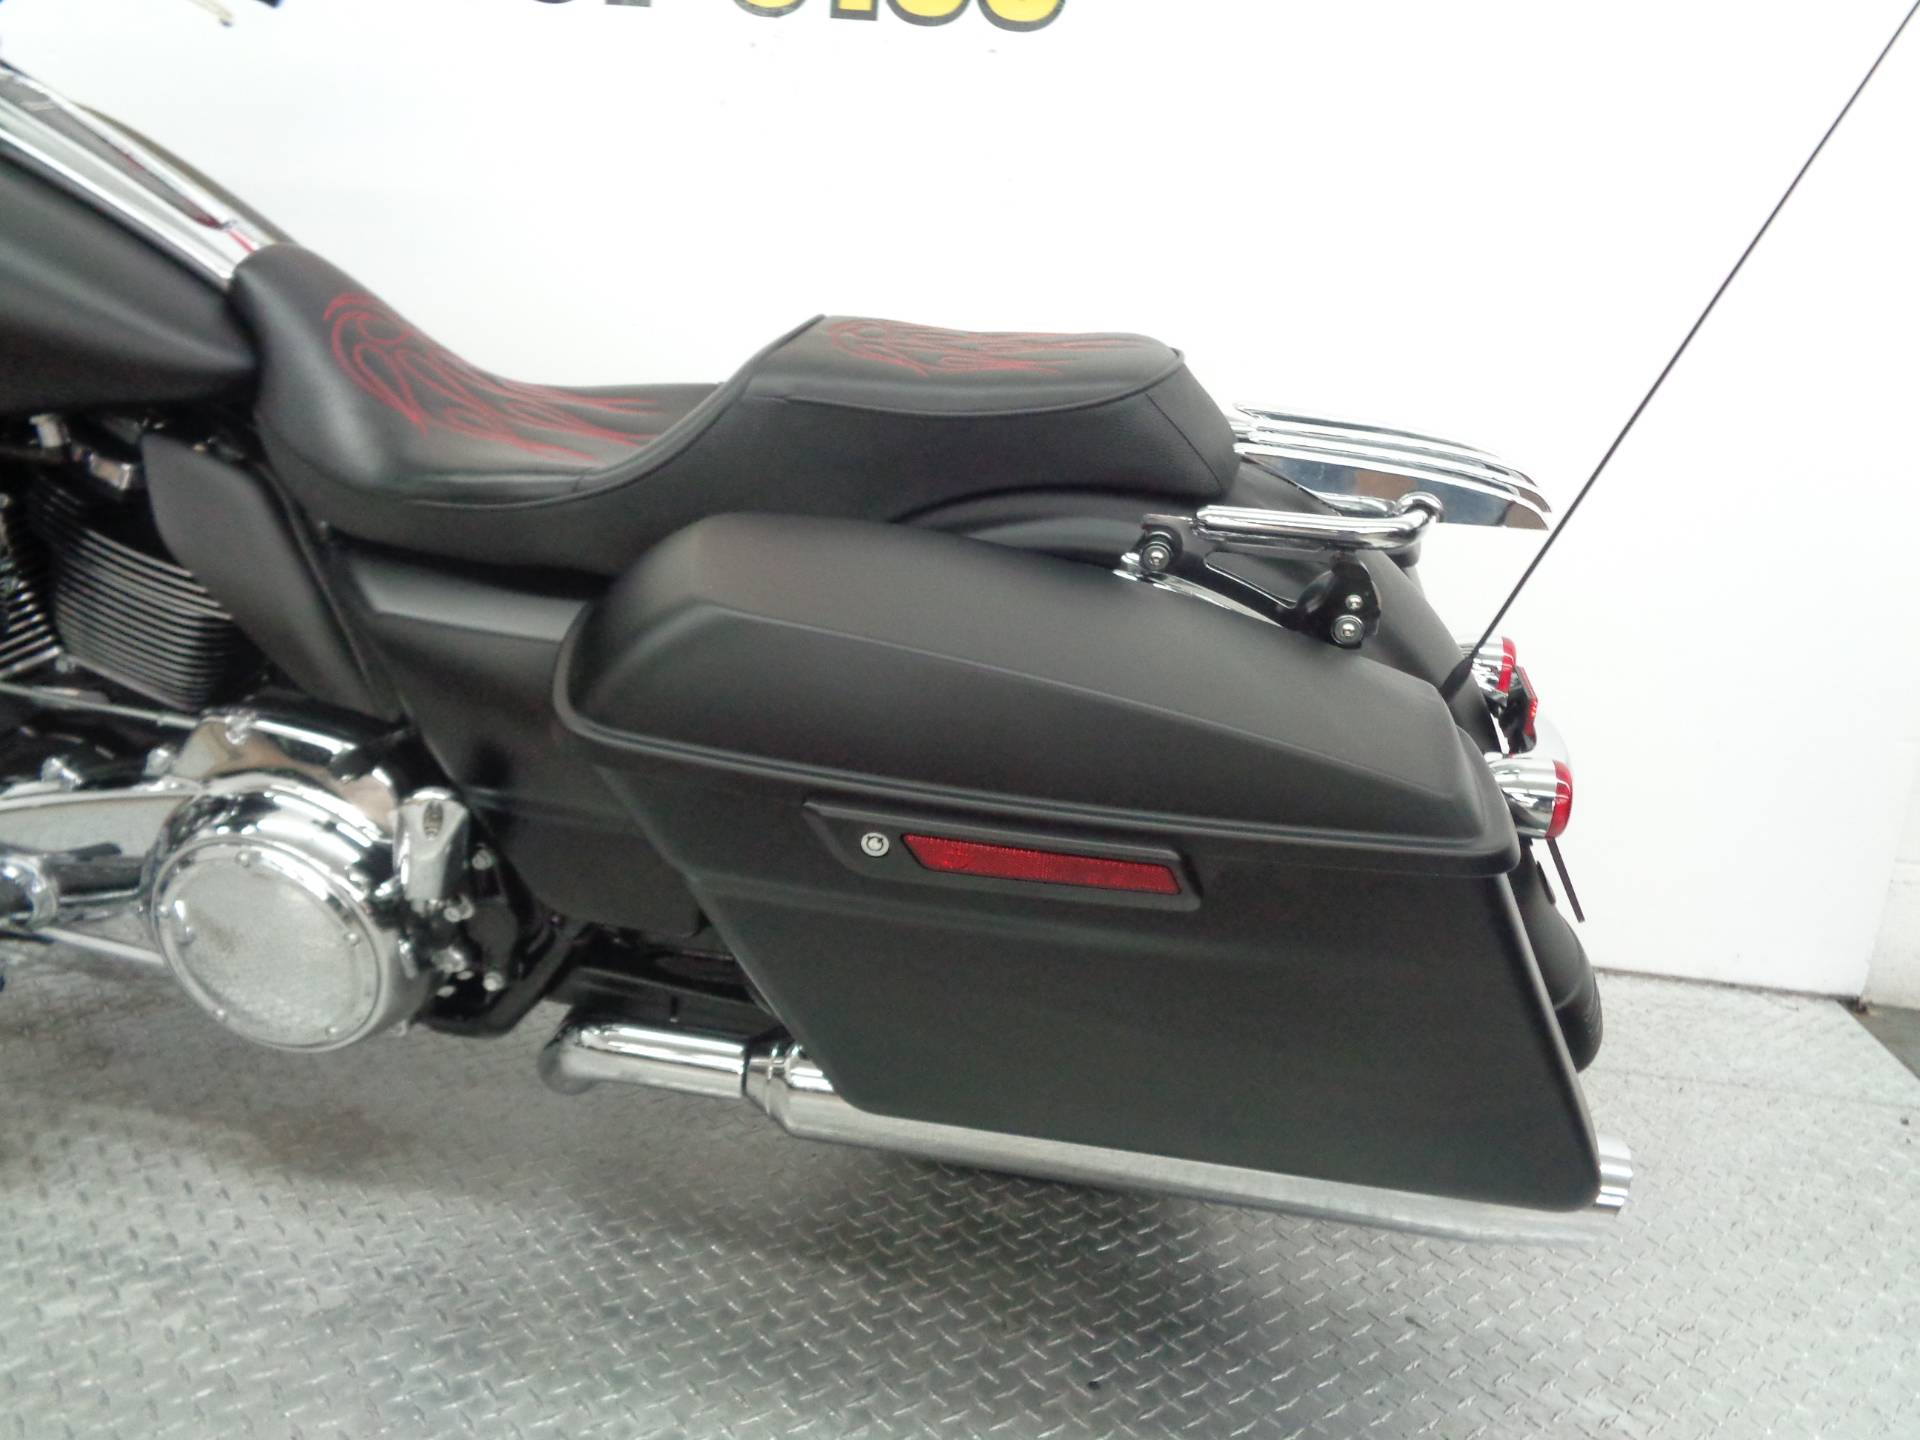 2017 Harley-Davidson Street Glide® Special in Tulsa, Oklahoma